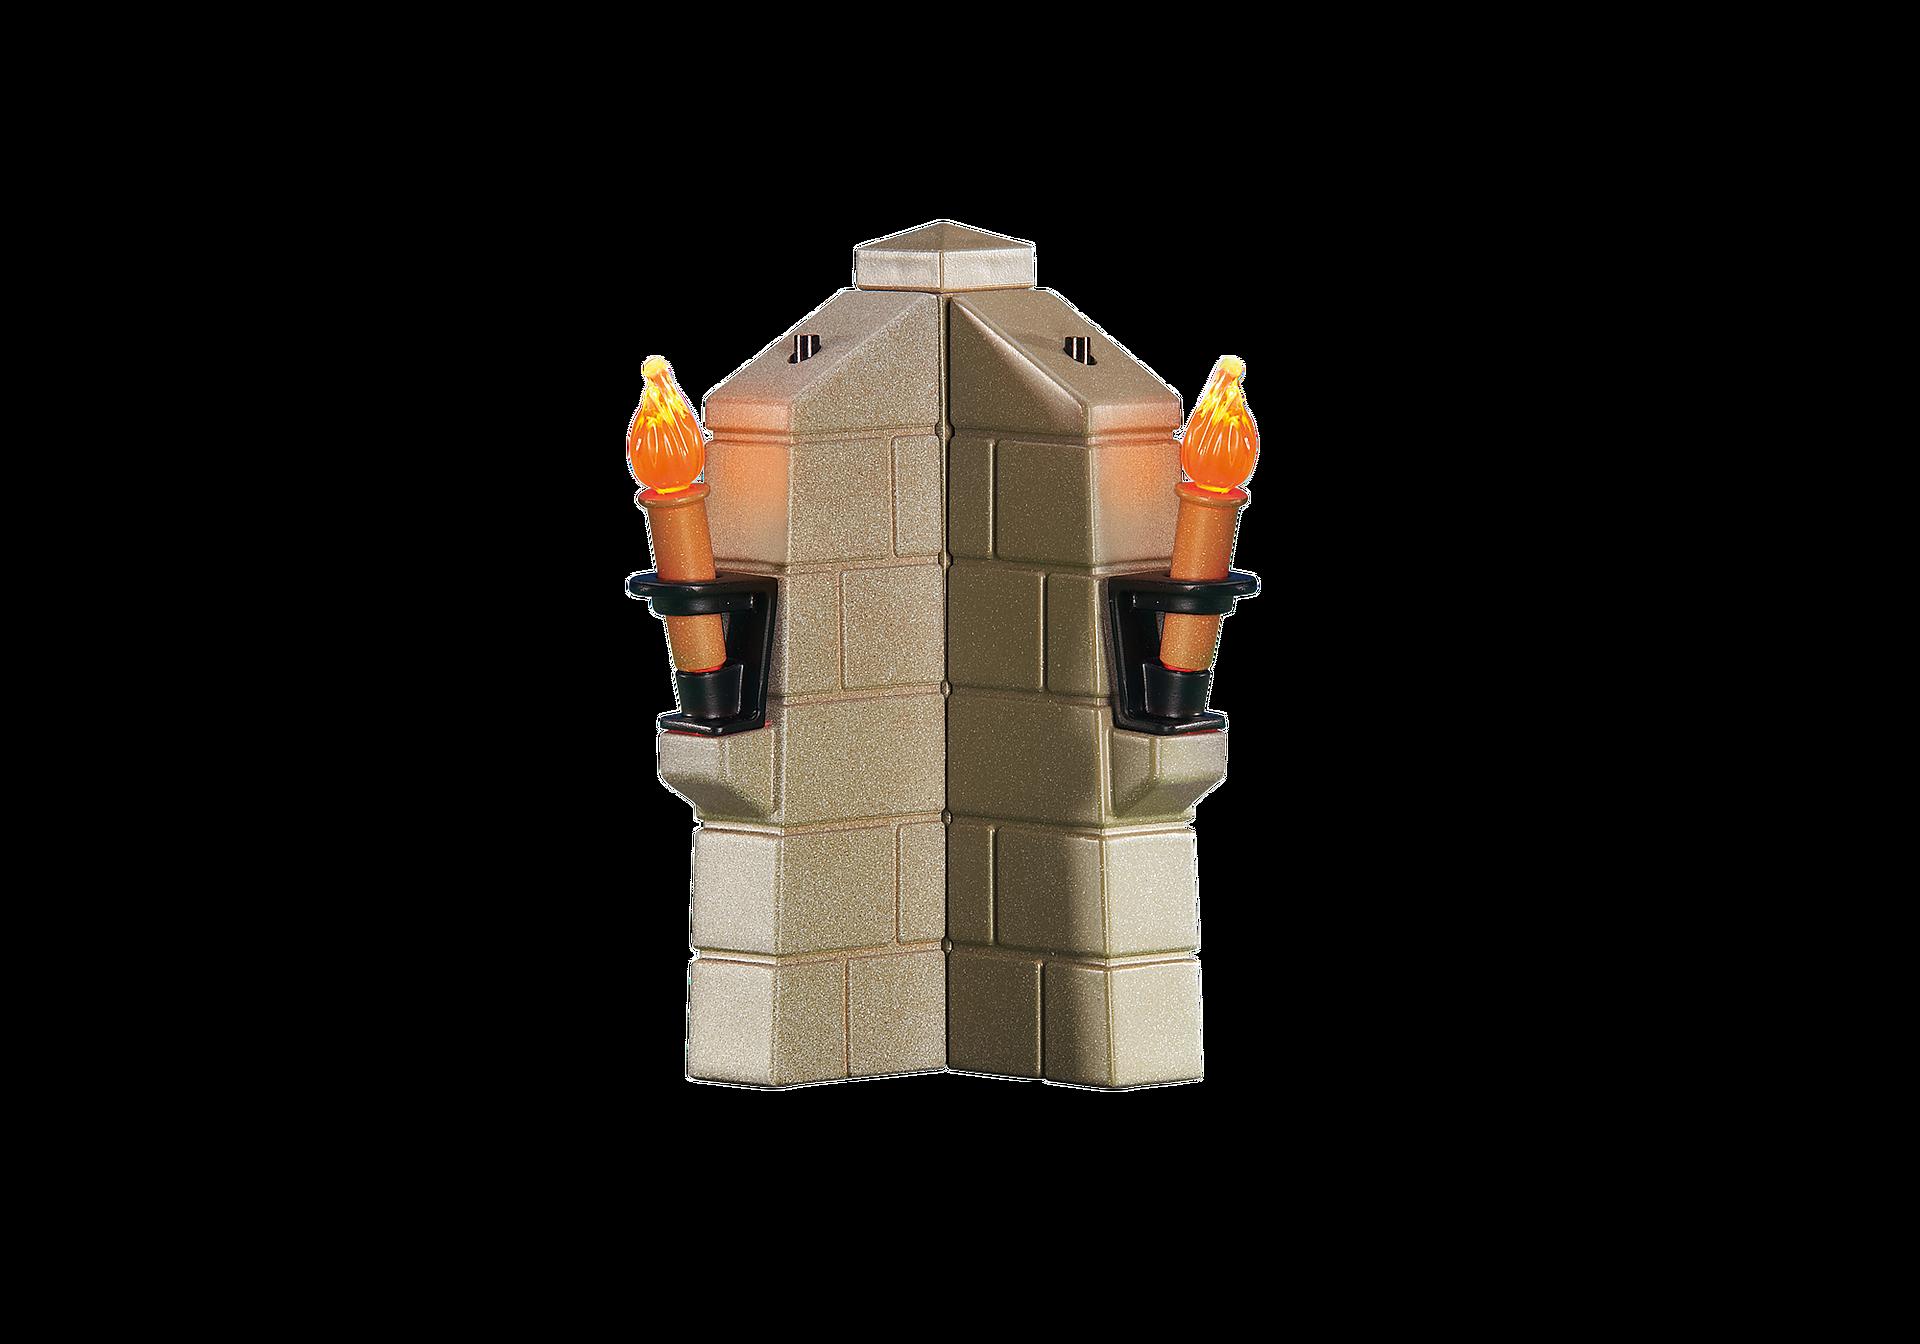 6370 Parapet avec 2 torches lumineuses zoom image1